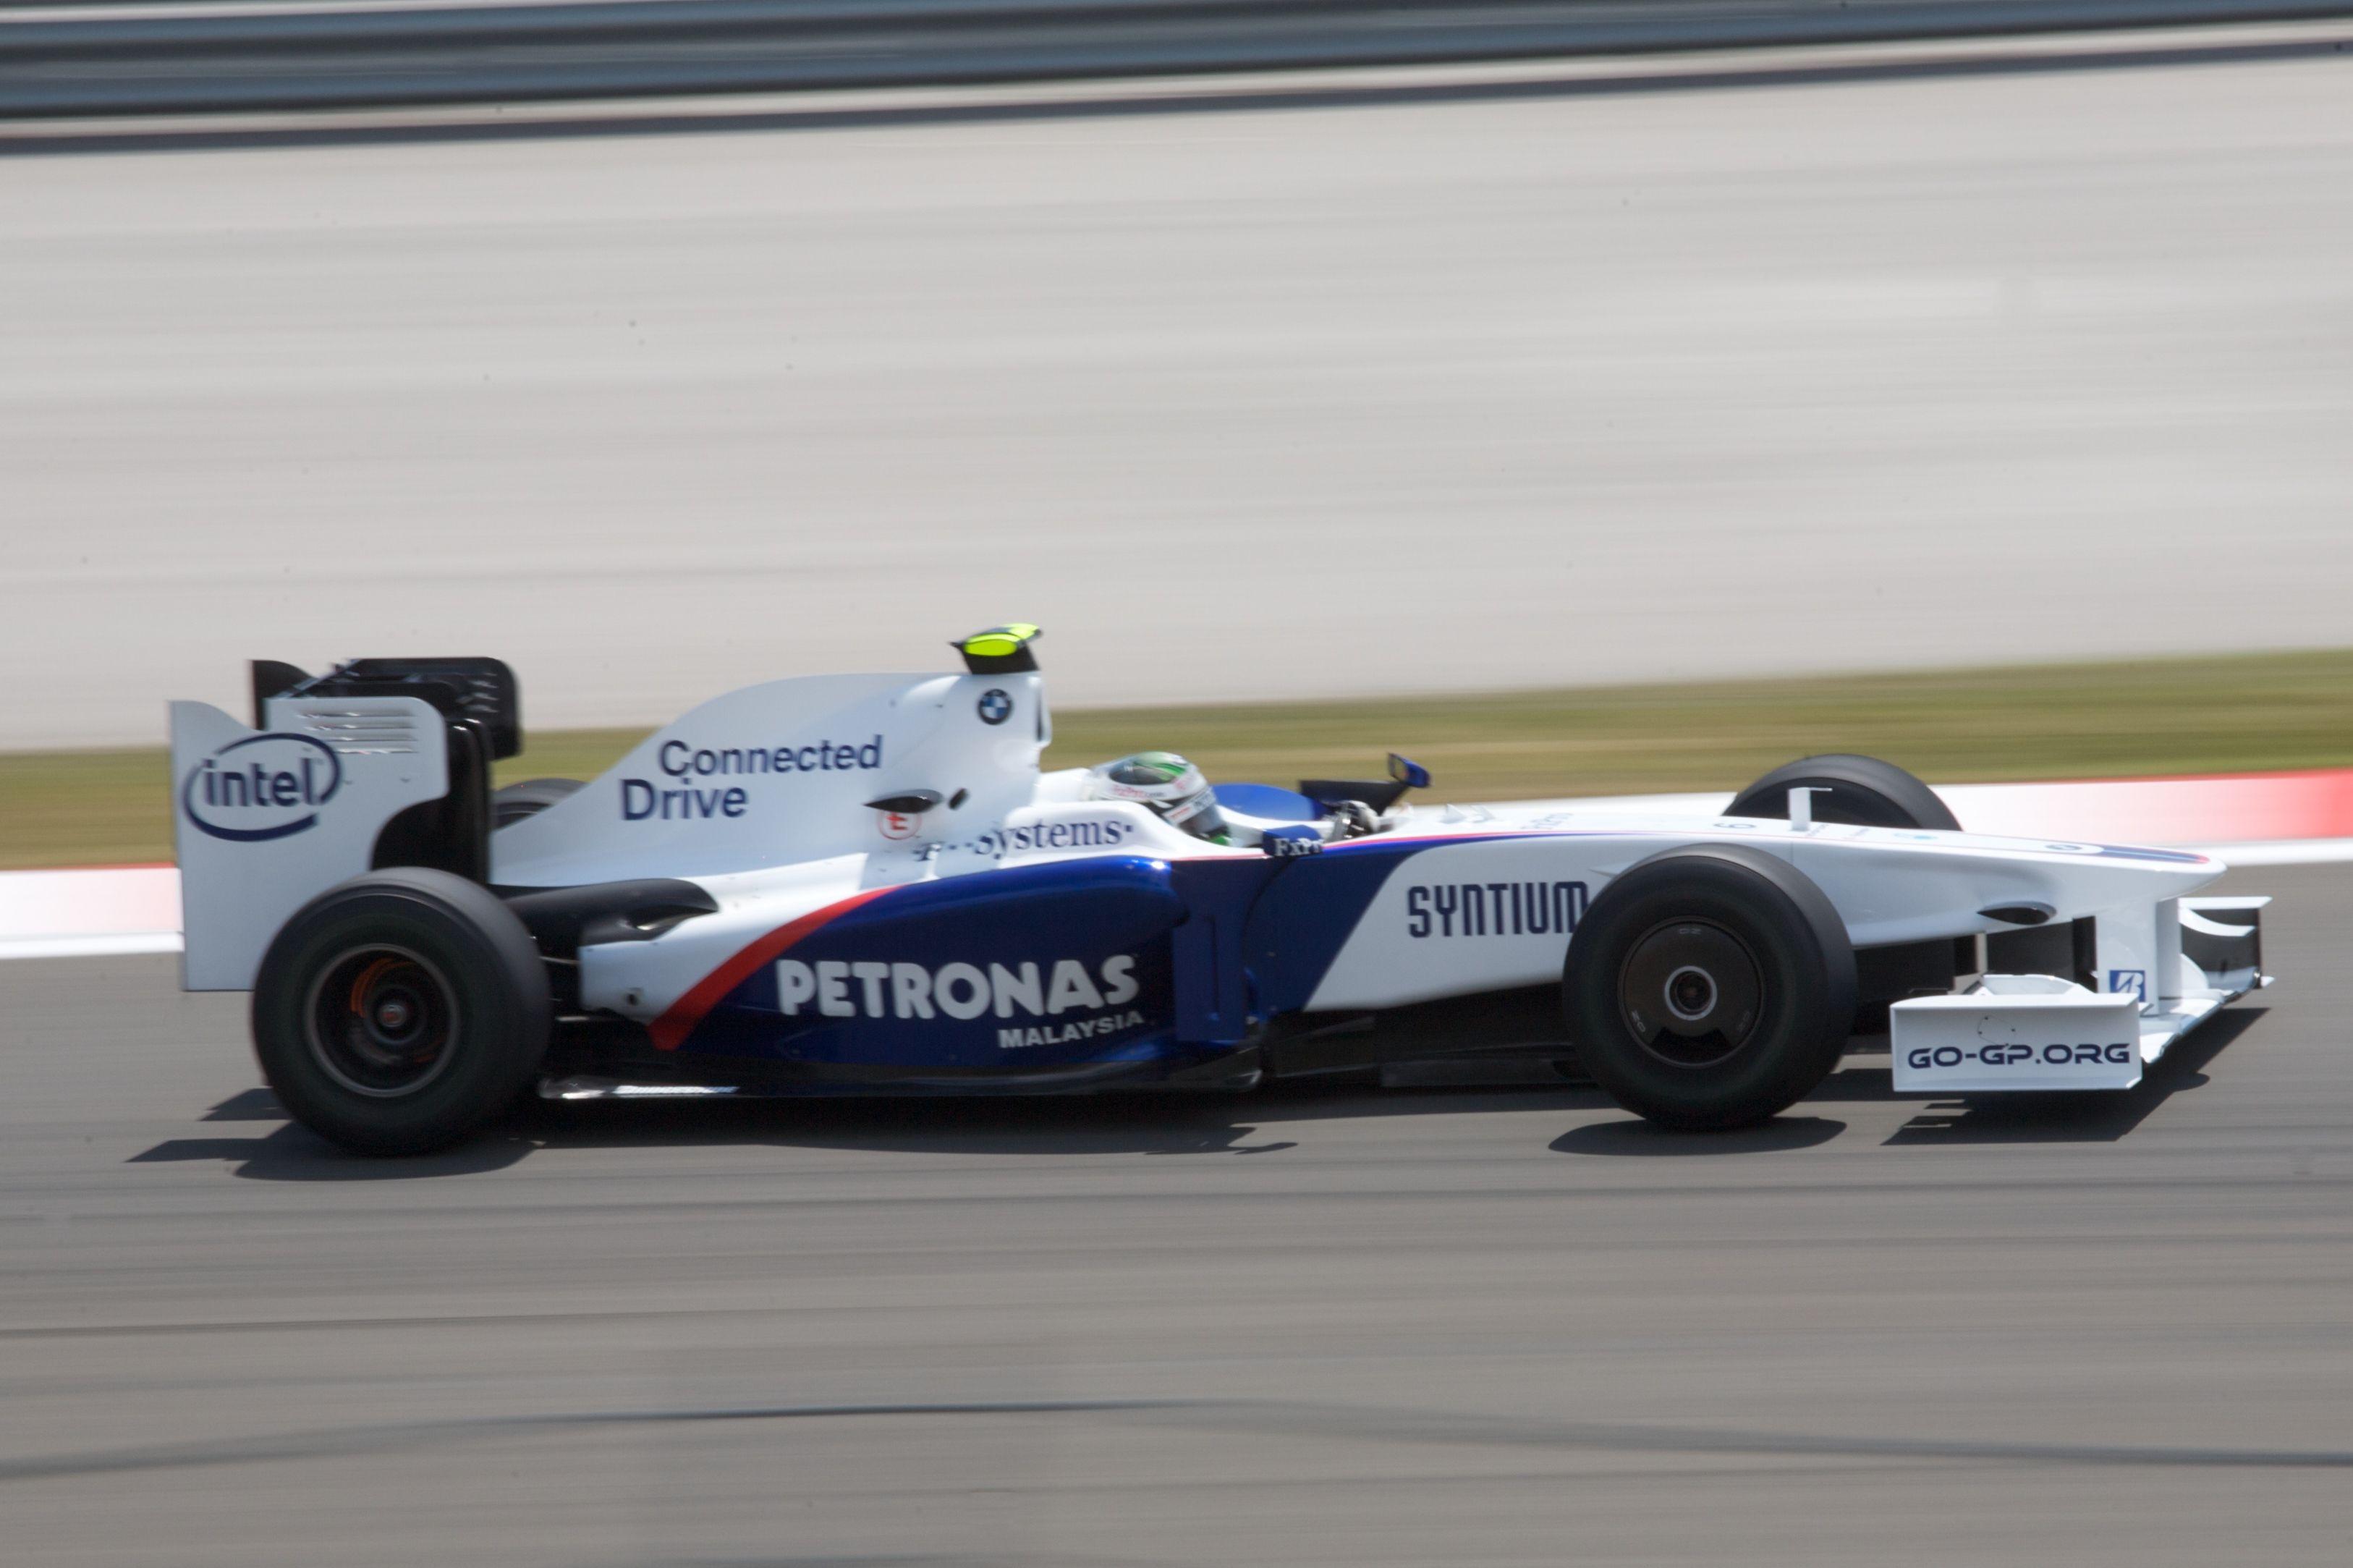 2006 BMW Sauber F1 06 Nick Heidfeld 2006 Formuła 1 Pinterest